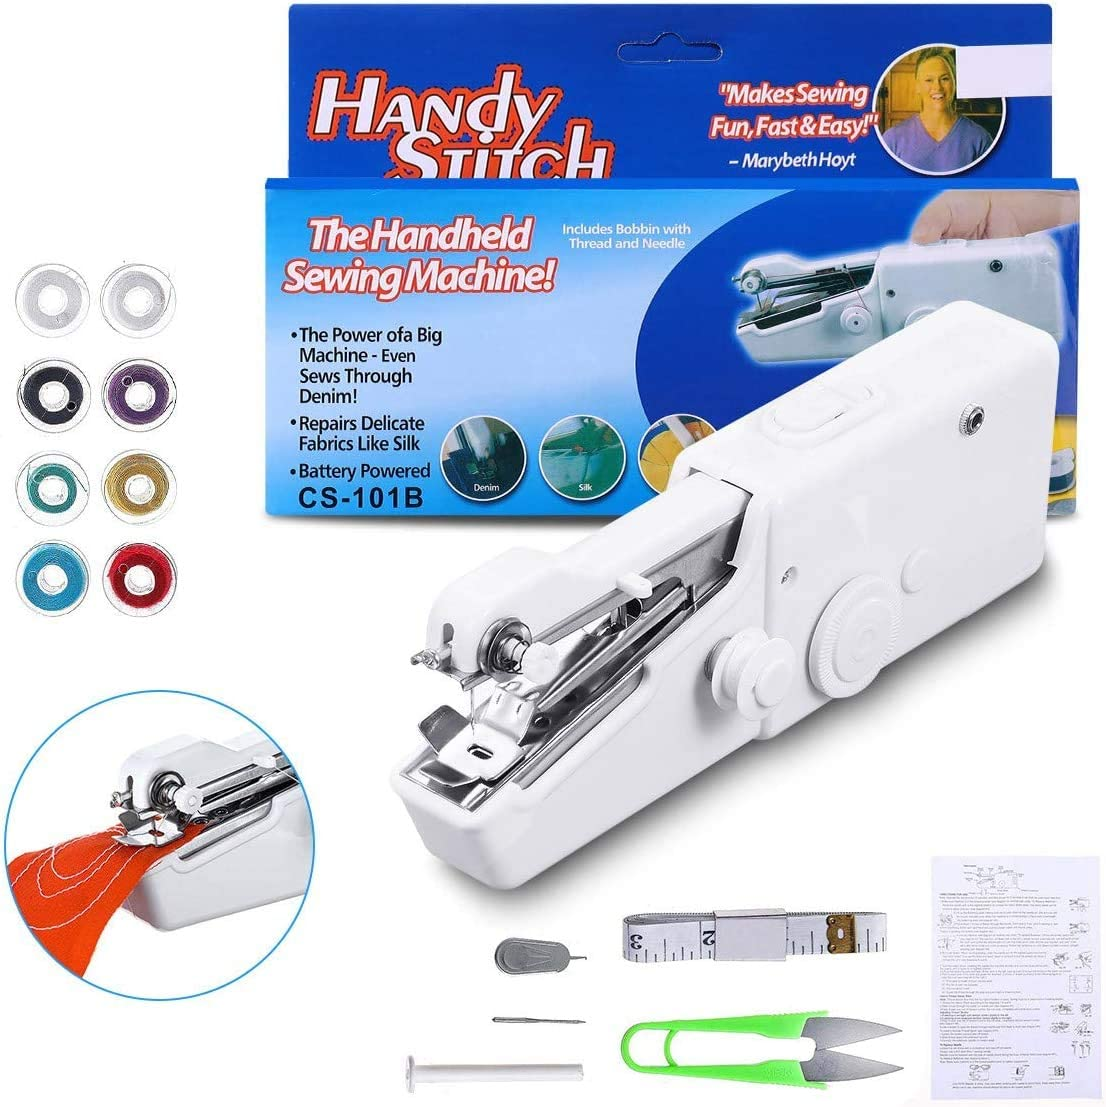 Mini Handheld Sewing Machine, LIUMY 15PCS Portable Sewing Machine,Mini Cordless Handheld Electric Stitch Tool for Quick Repairing, Fabric, Clothing, Kids Cloth, Home Travel Use